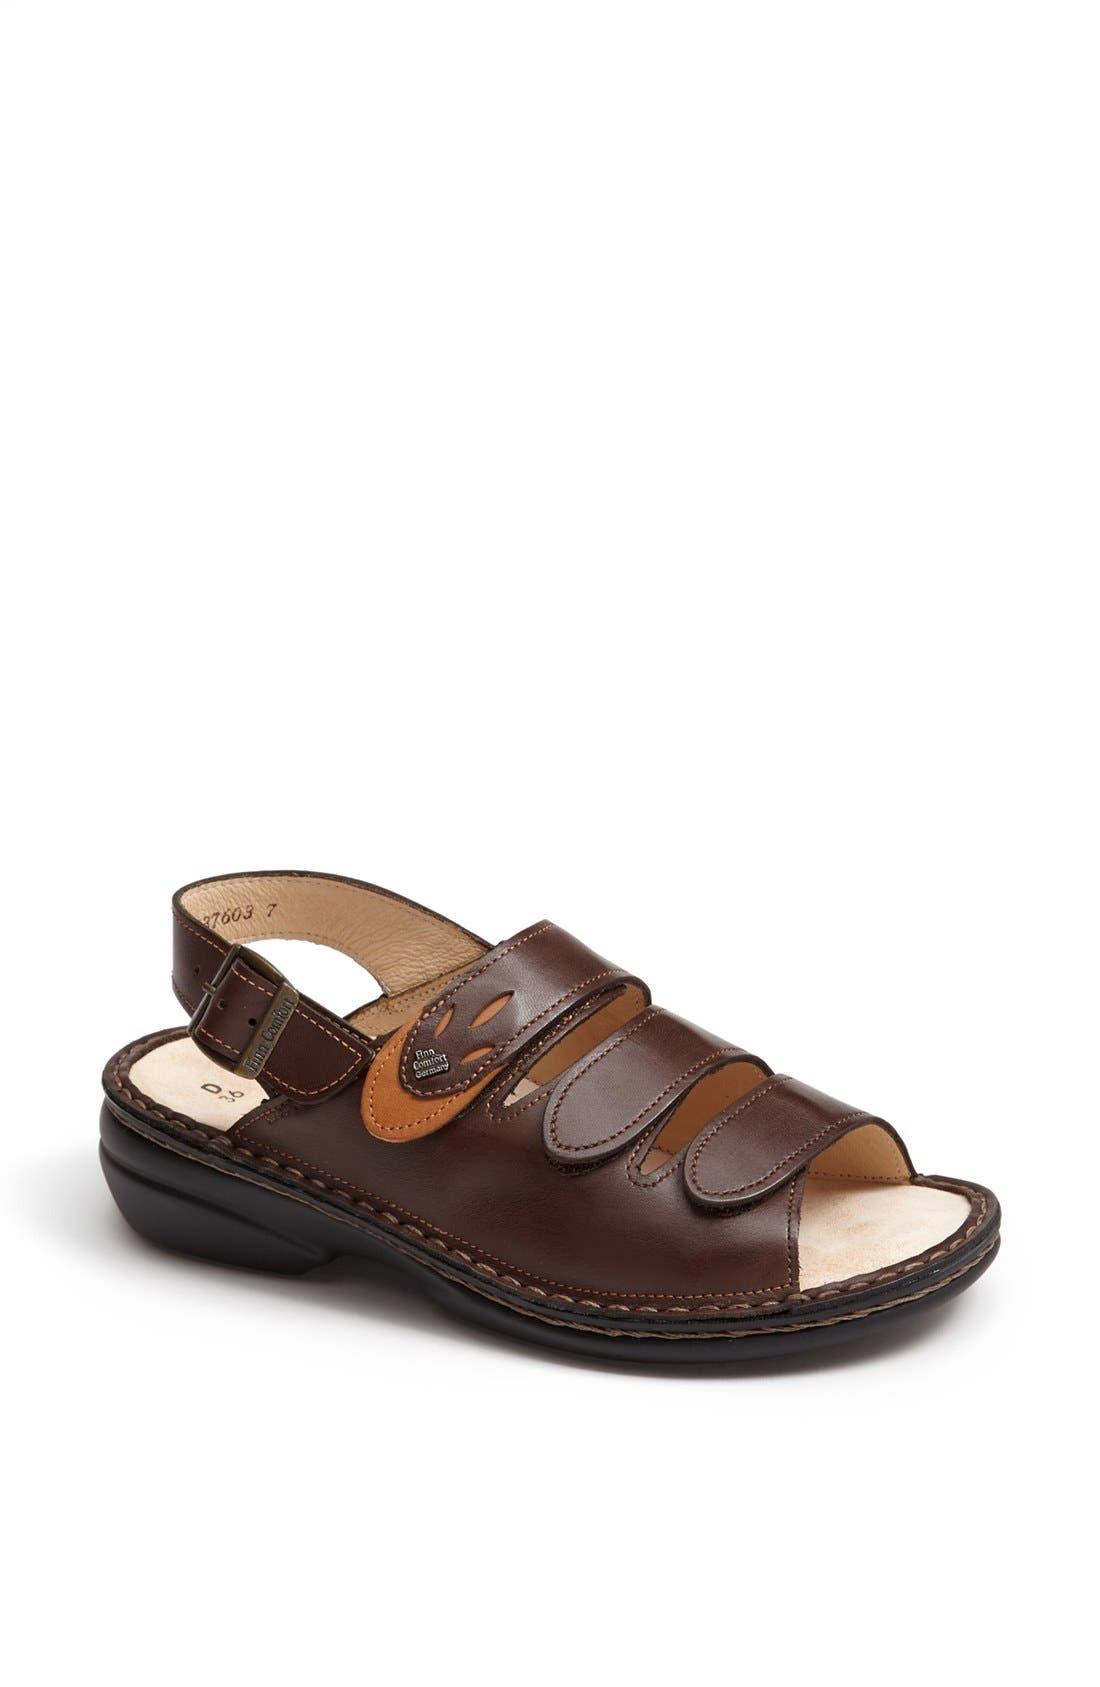 Main Image - Finn Comfort 'Saloniki' Sandal